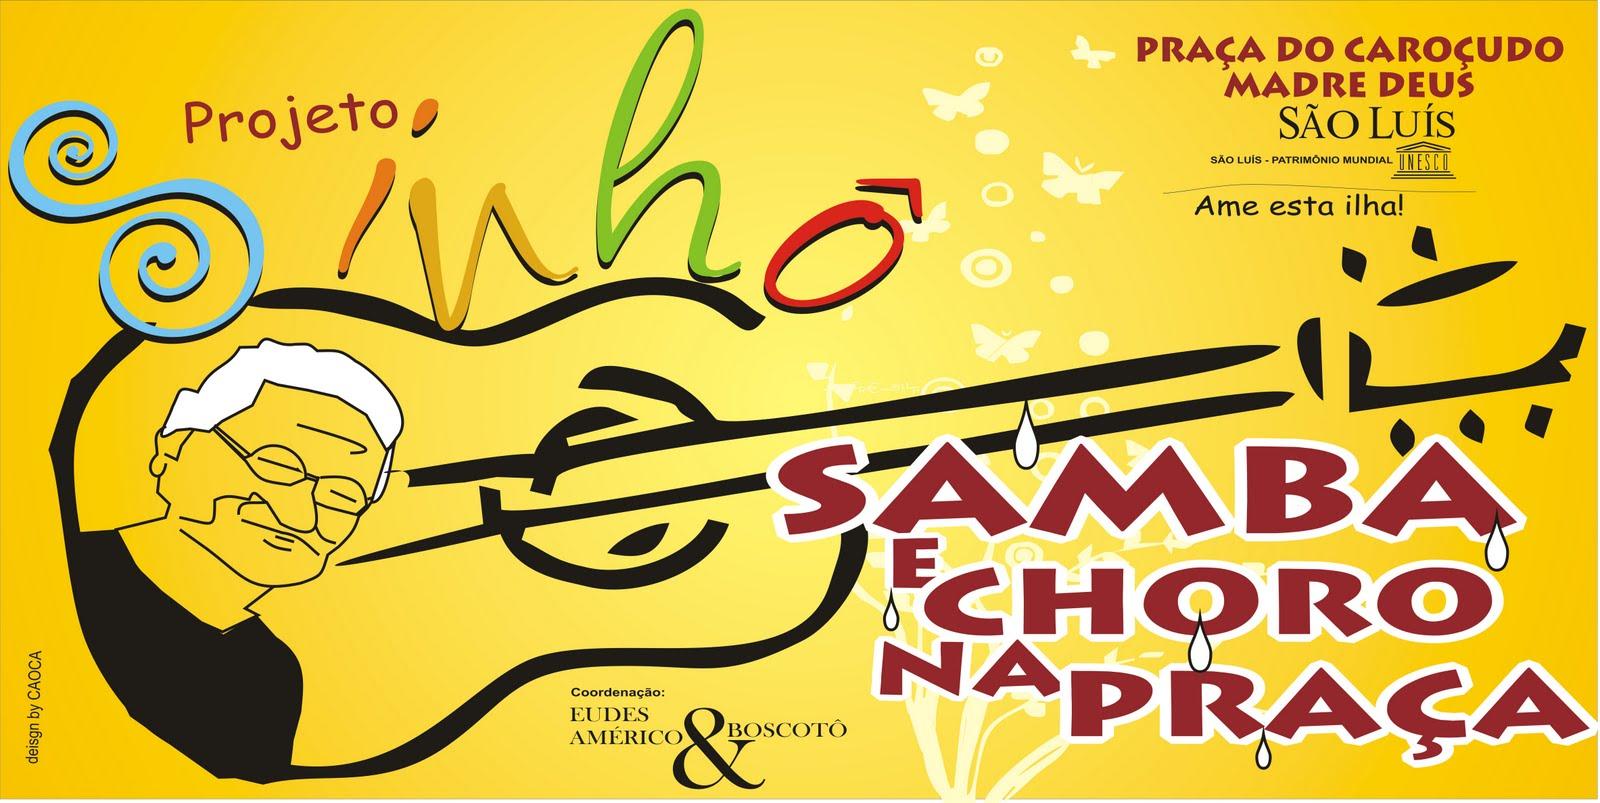 Projeto Sinhô:Samba e Choro